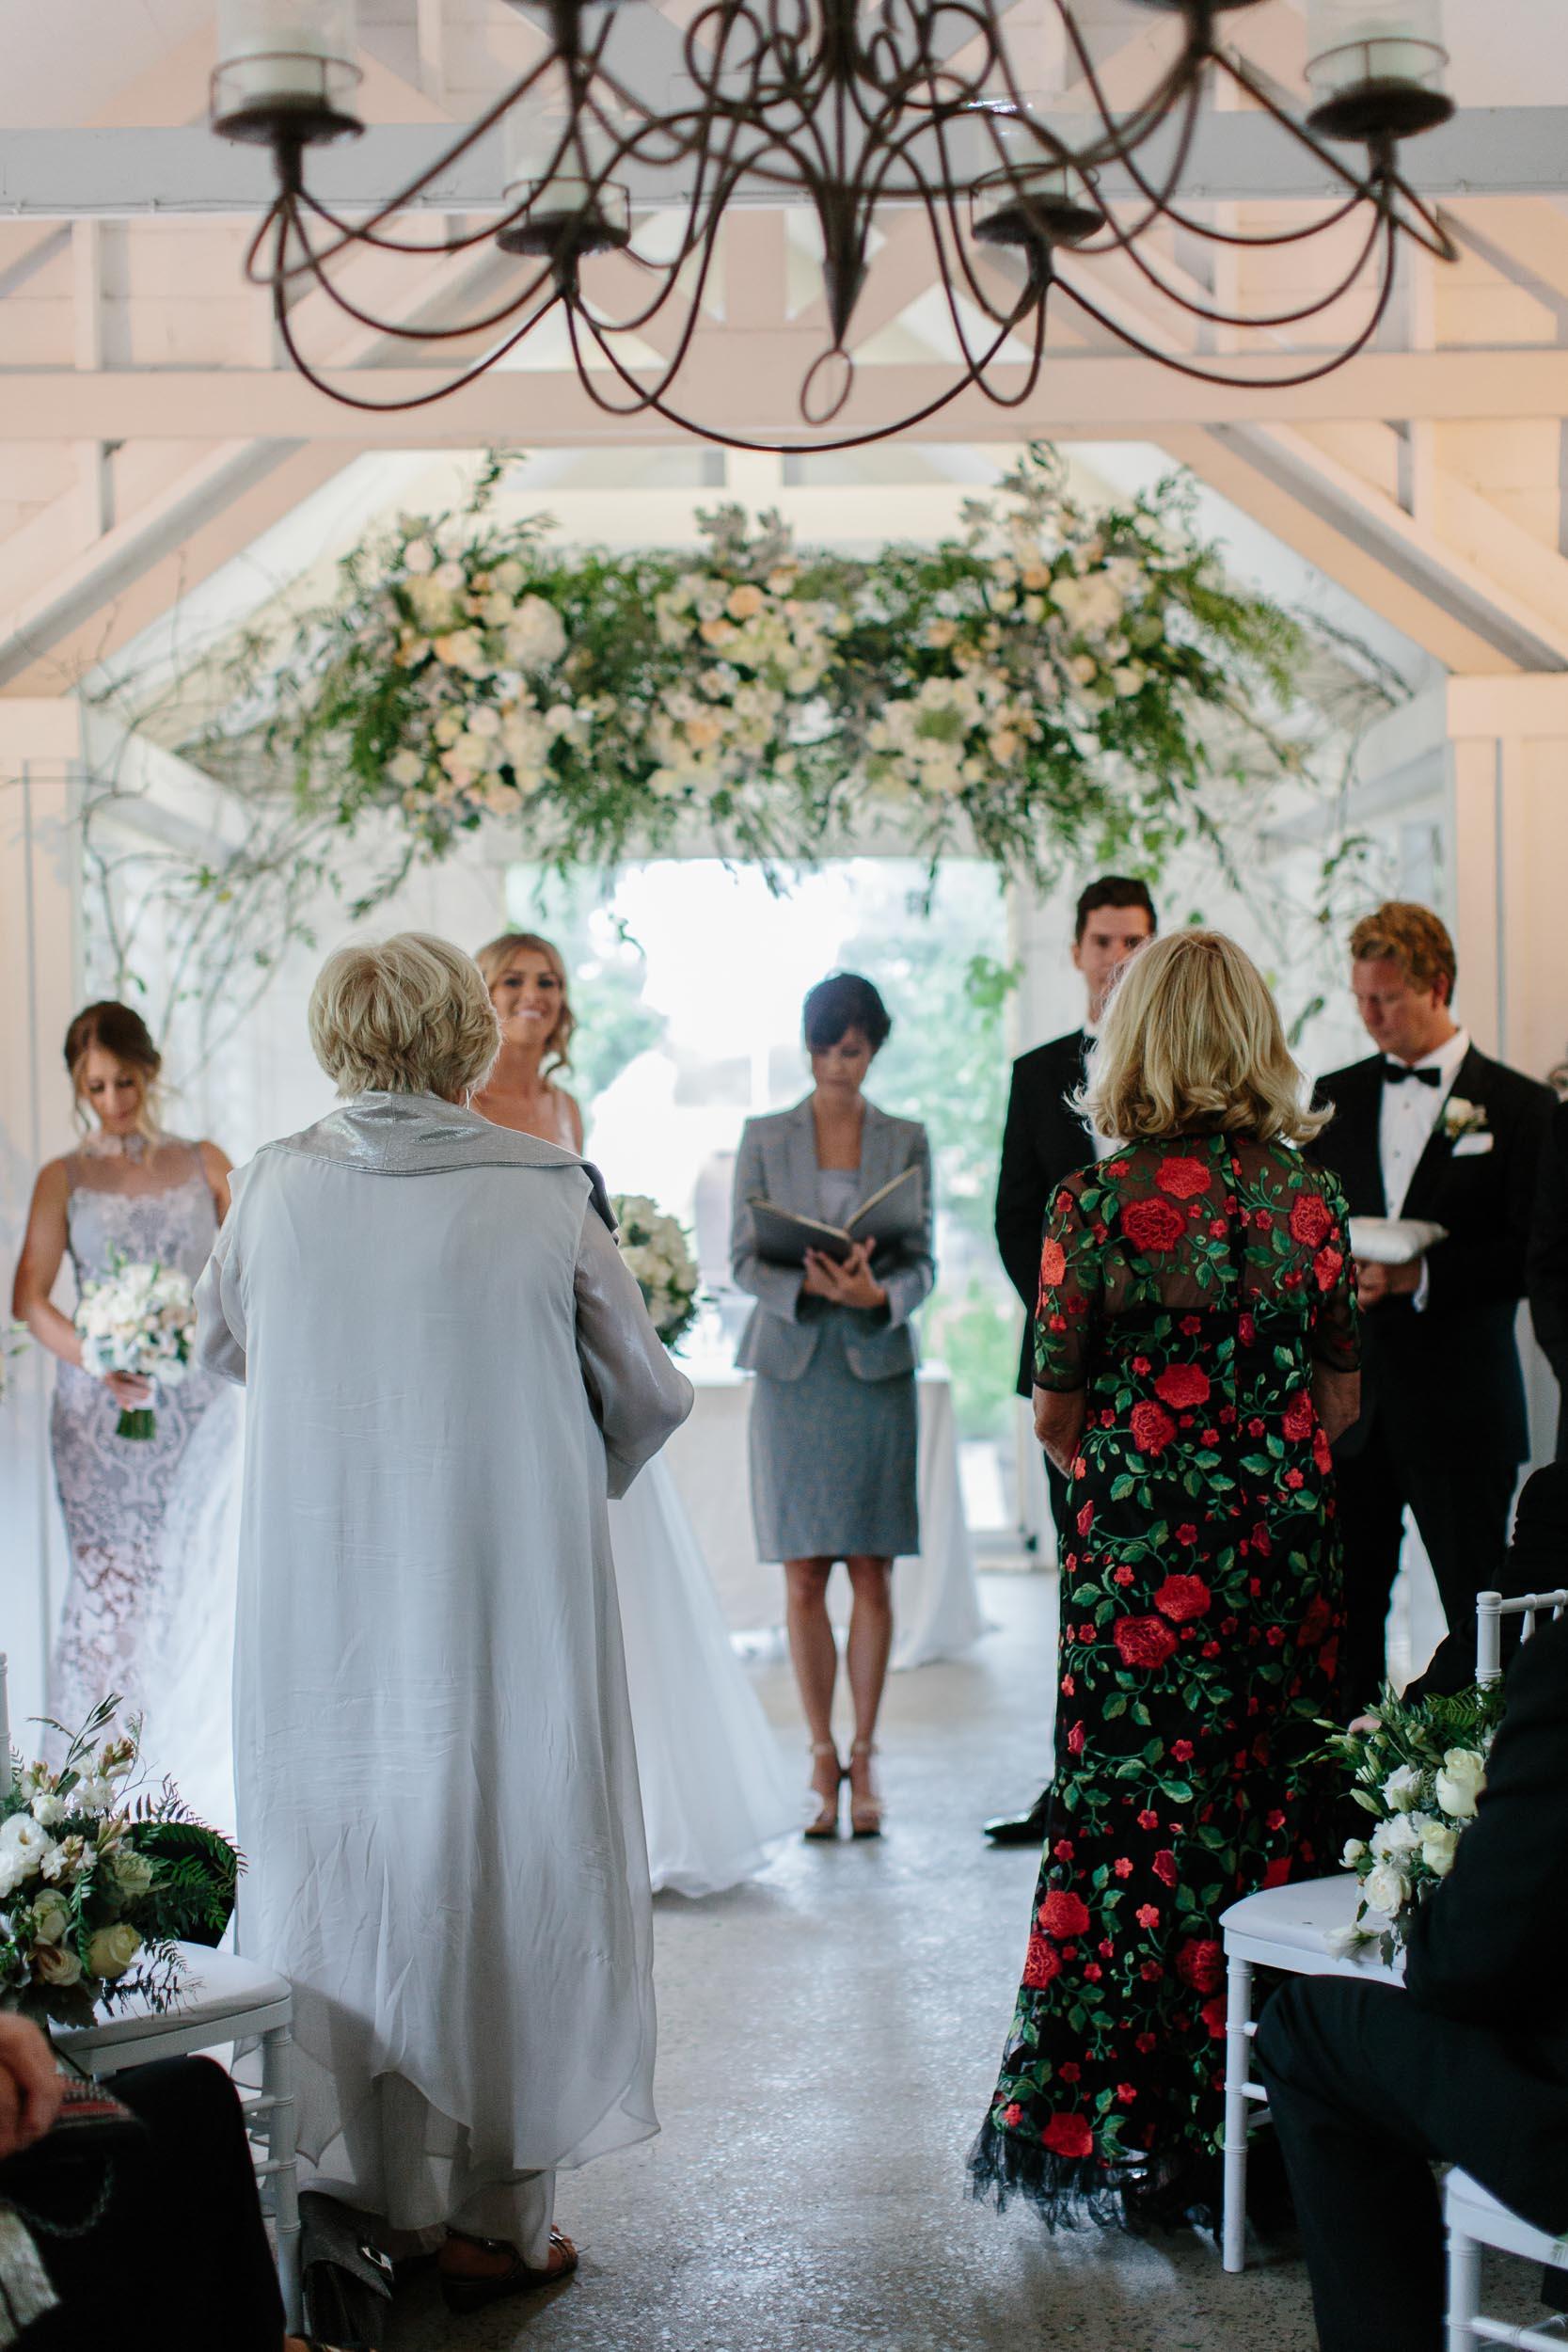 Kas-Richards-Mornington-Peninsula-Private-Property-Wedding-Marianna-Hardwick-Gown-251.jpg